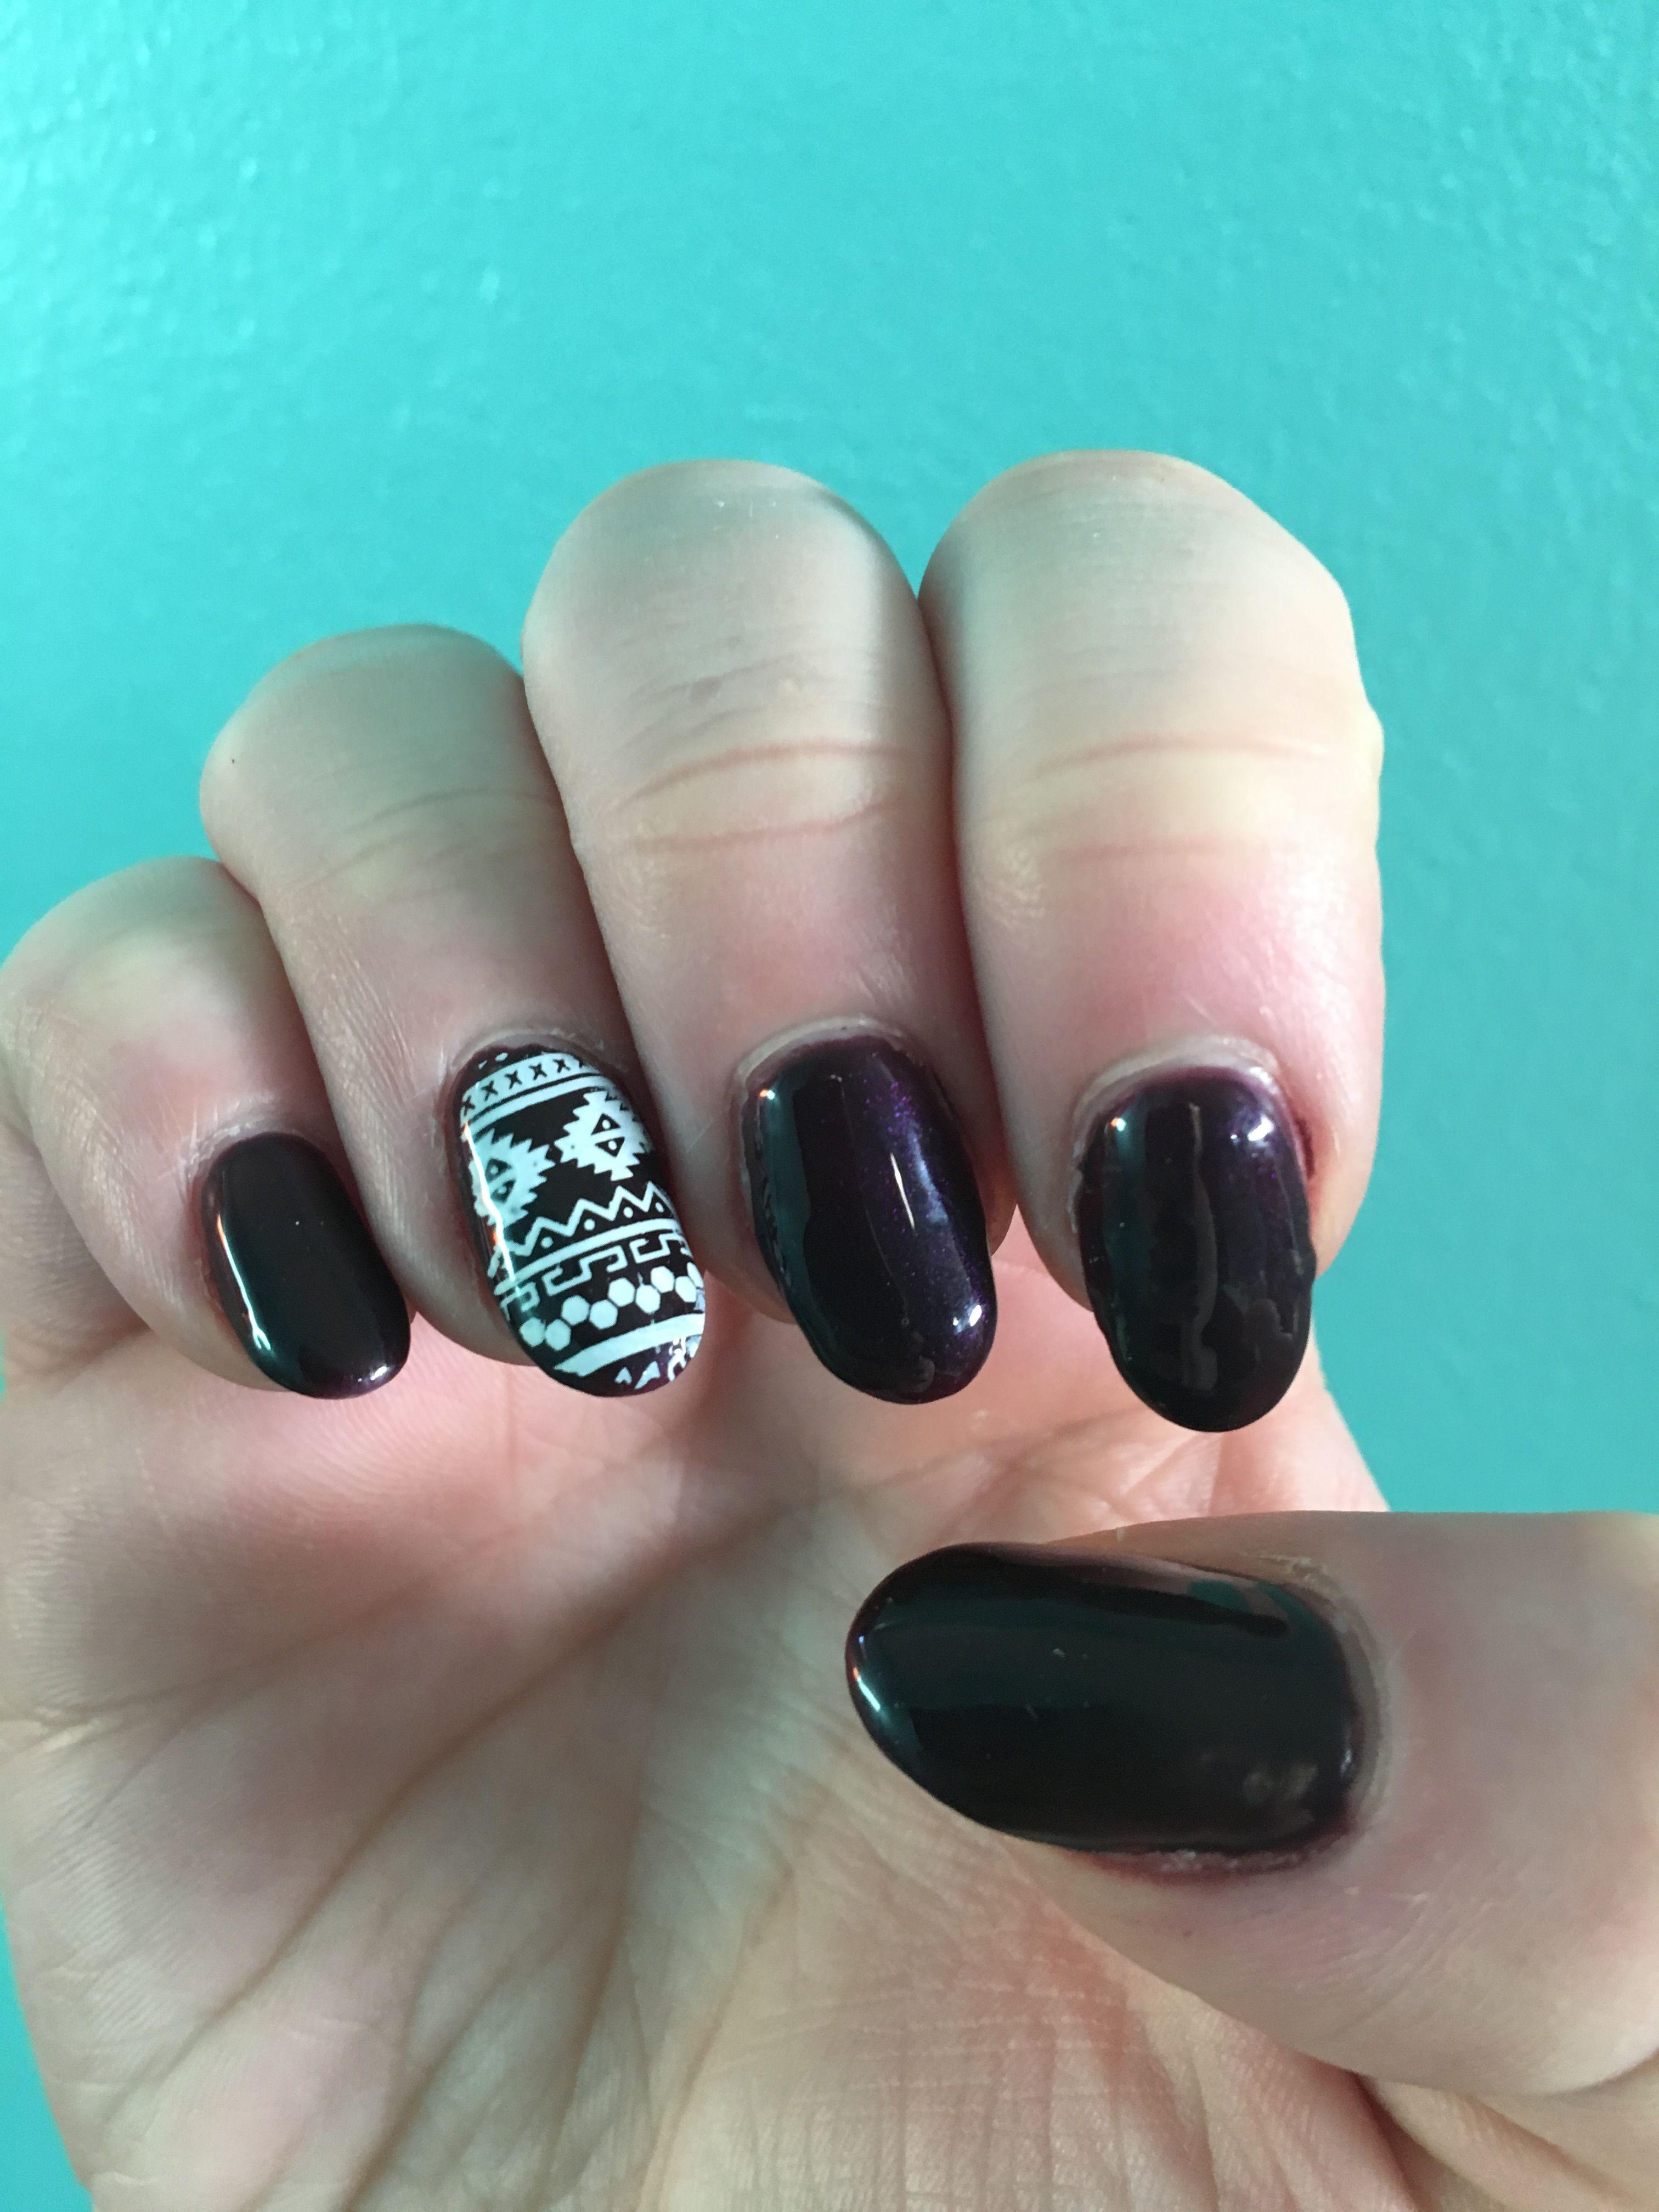 Pin by Briana Callies on Deja Vu Nails | Pinterest